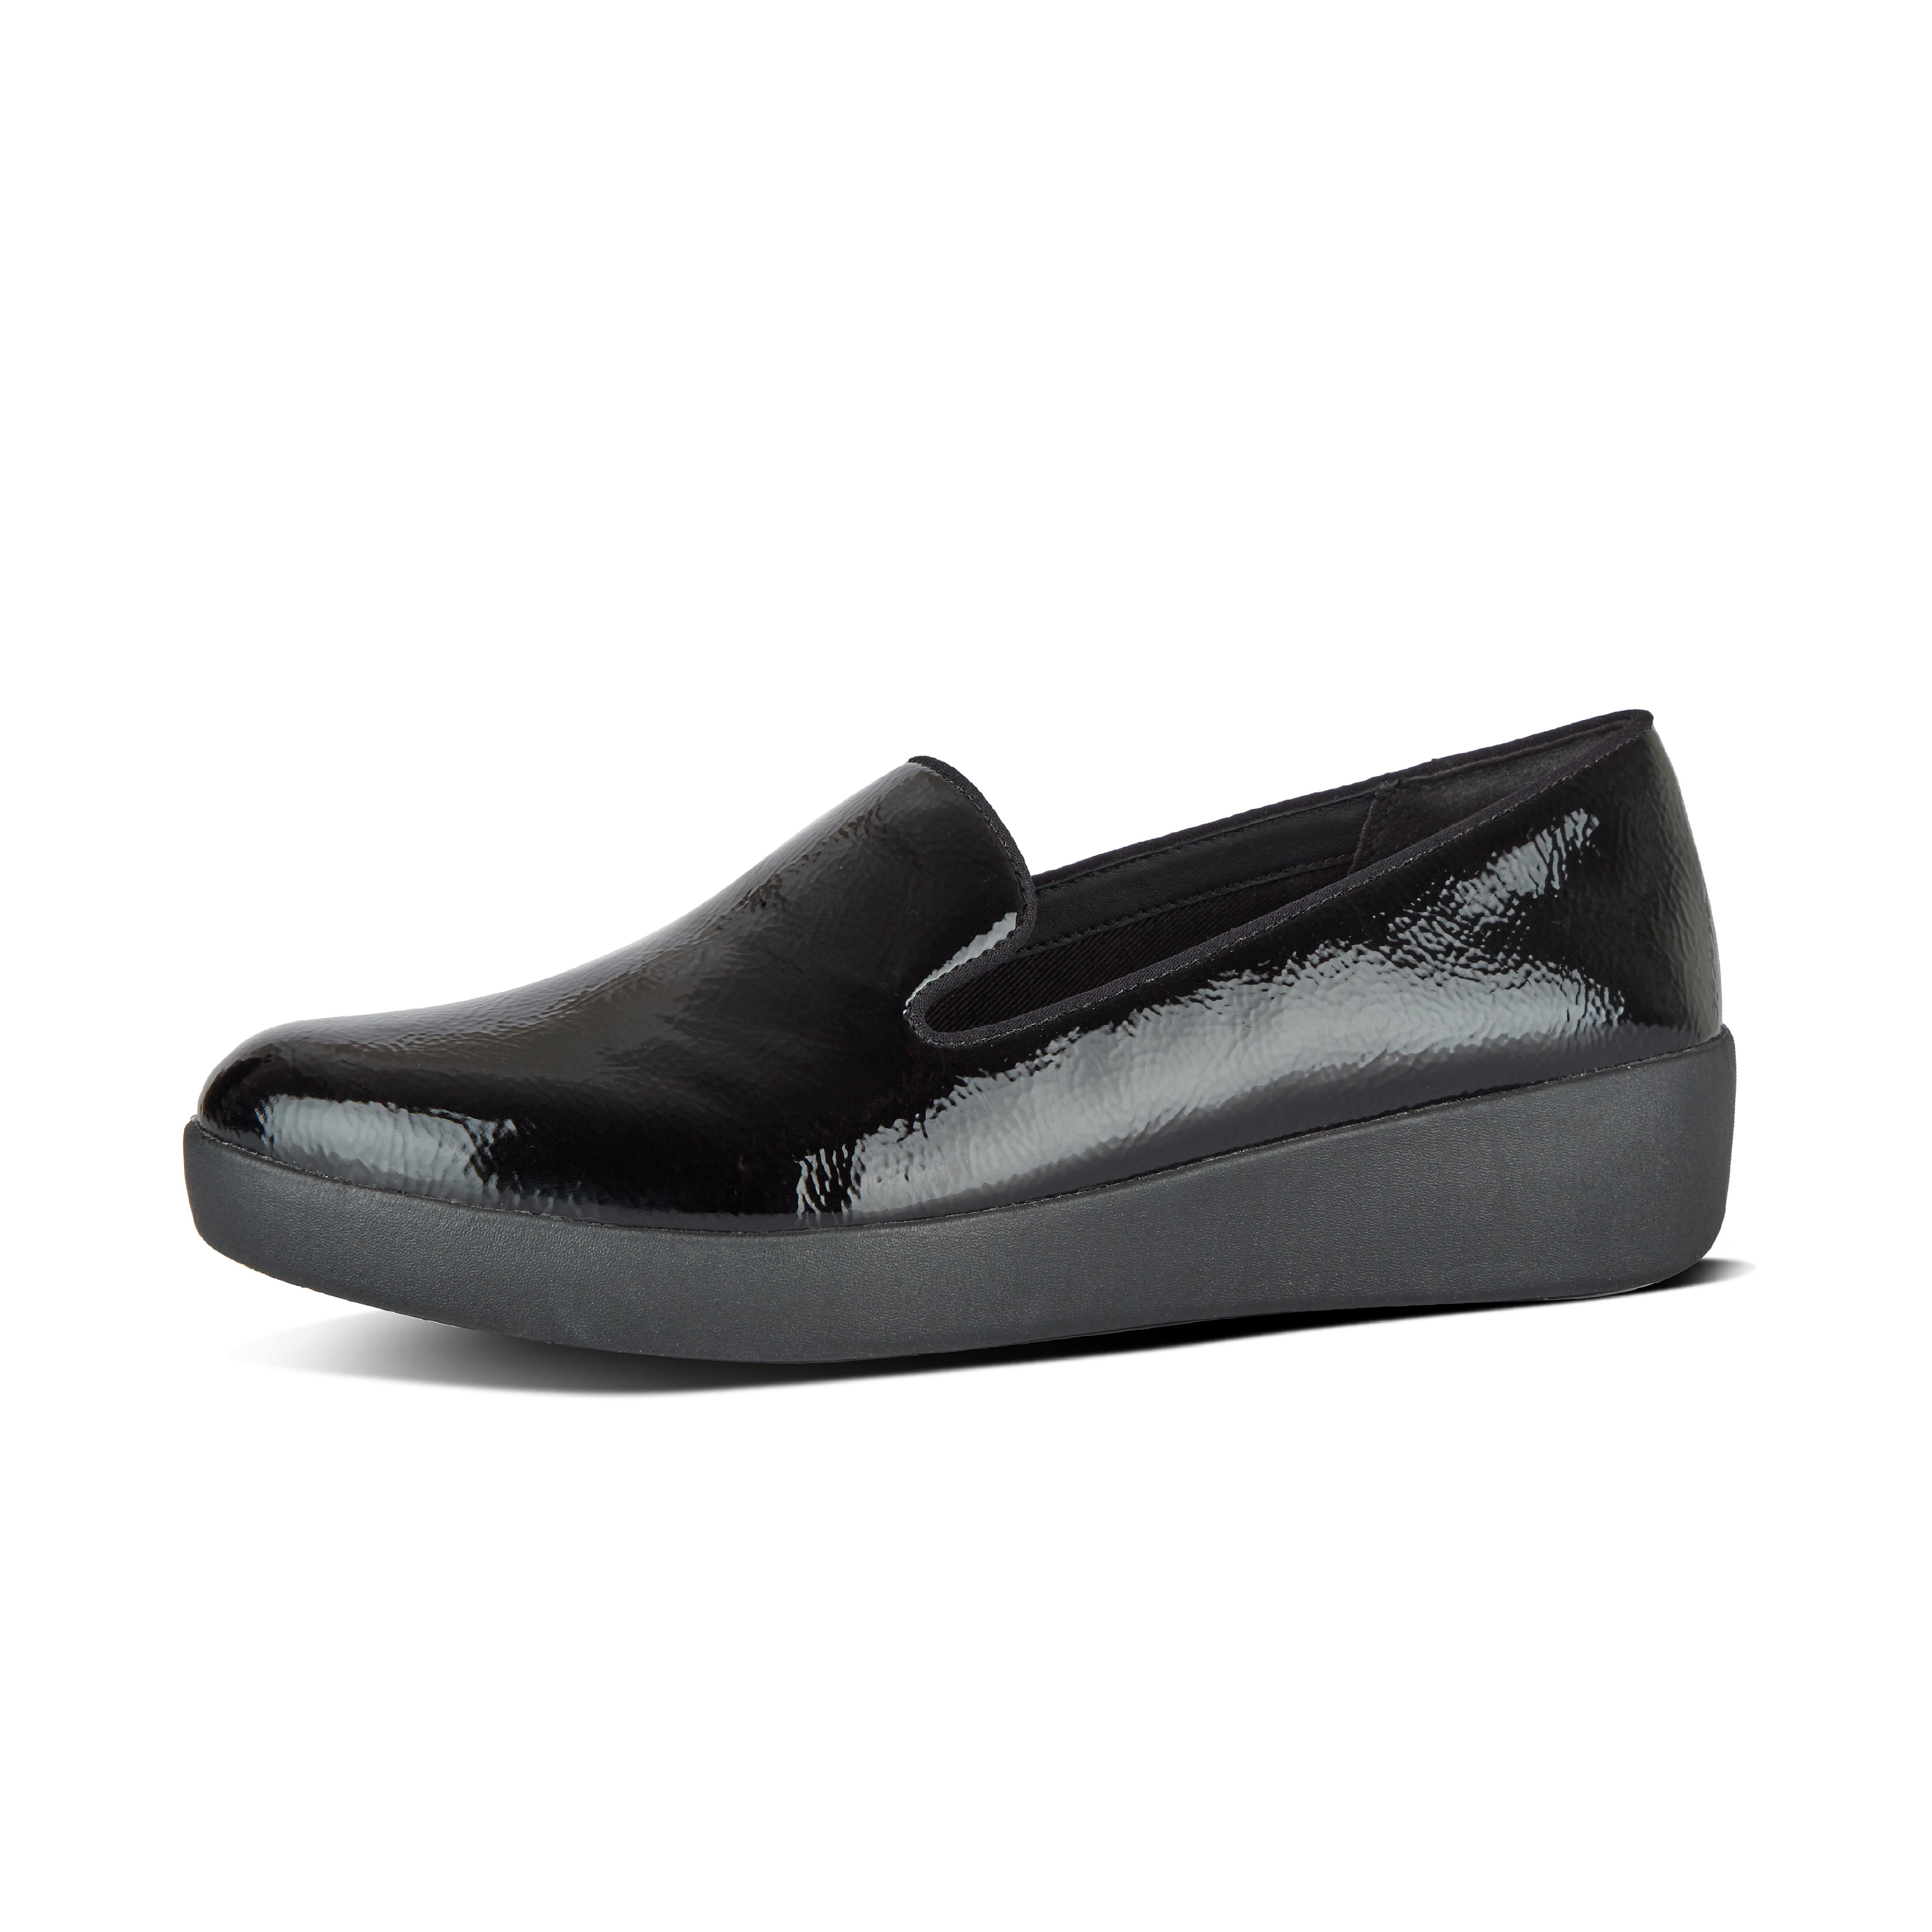 Audrey crinkle patent smoking slippers black m94 001?v=3